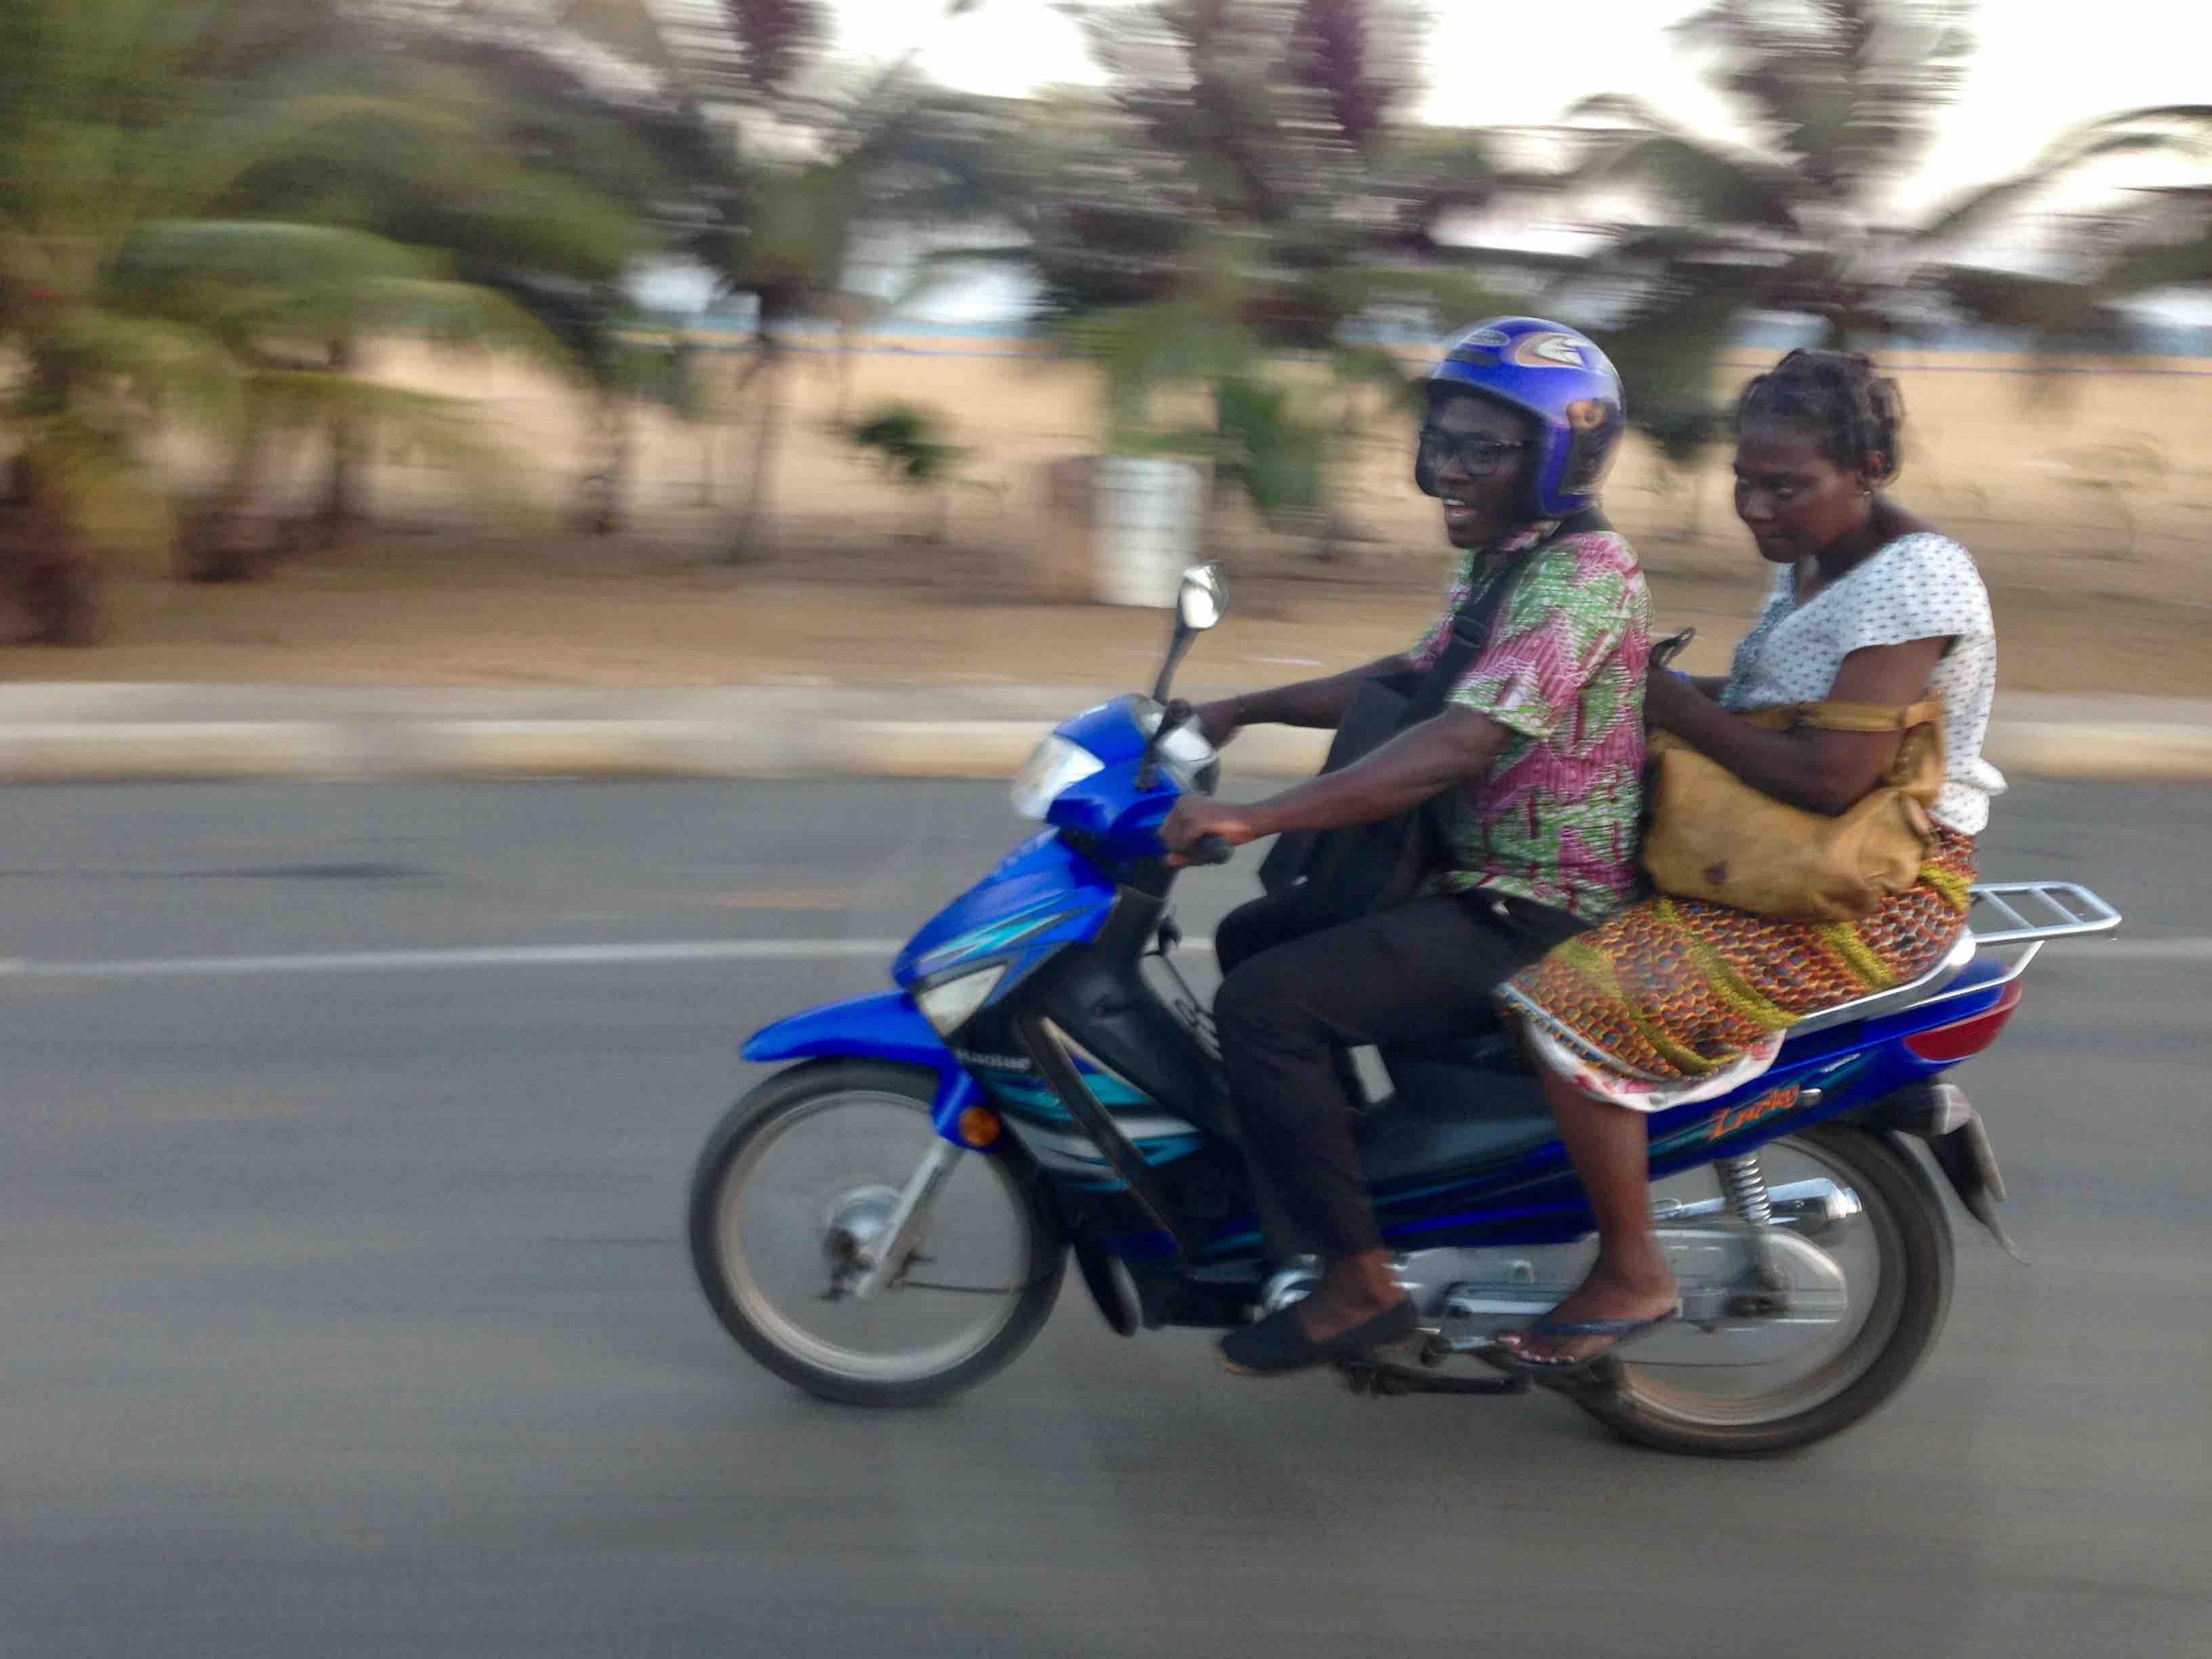 Motorcycling in Bd de la Marina, Lome, Togo. #JujuFilms